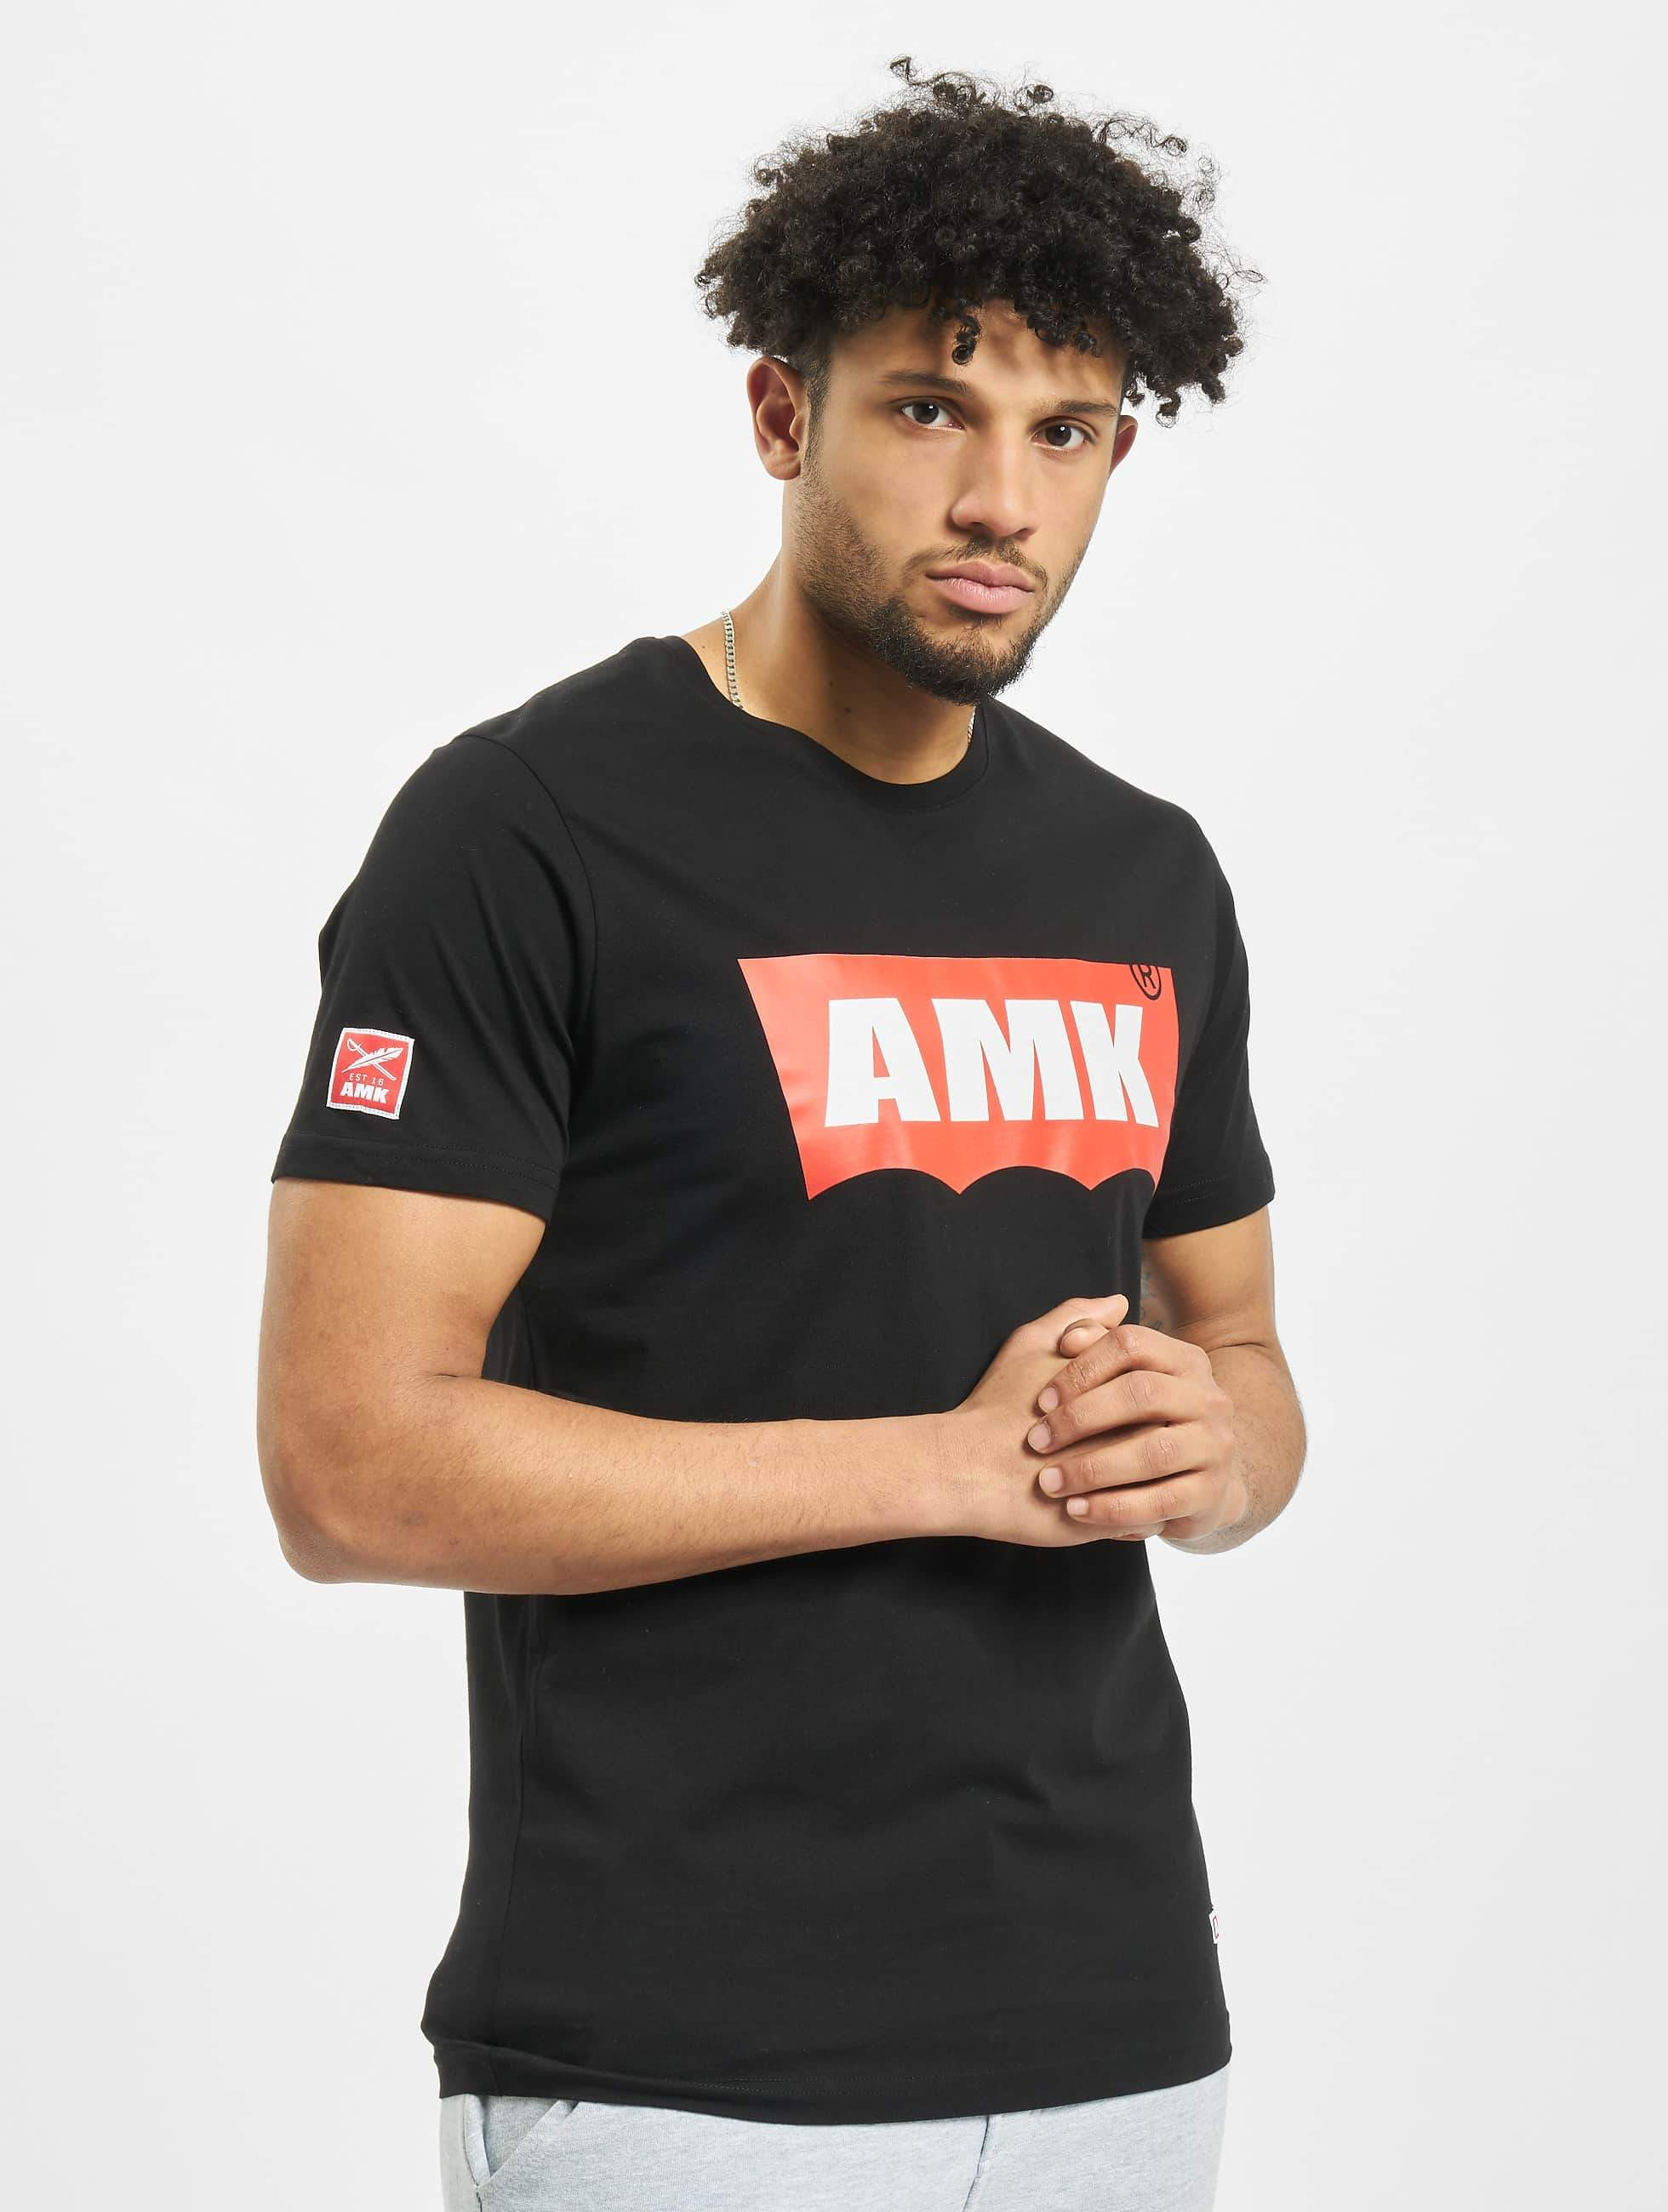 AMK | Original Waves noir Homme T-Shirt